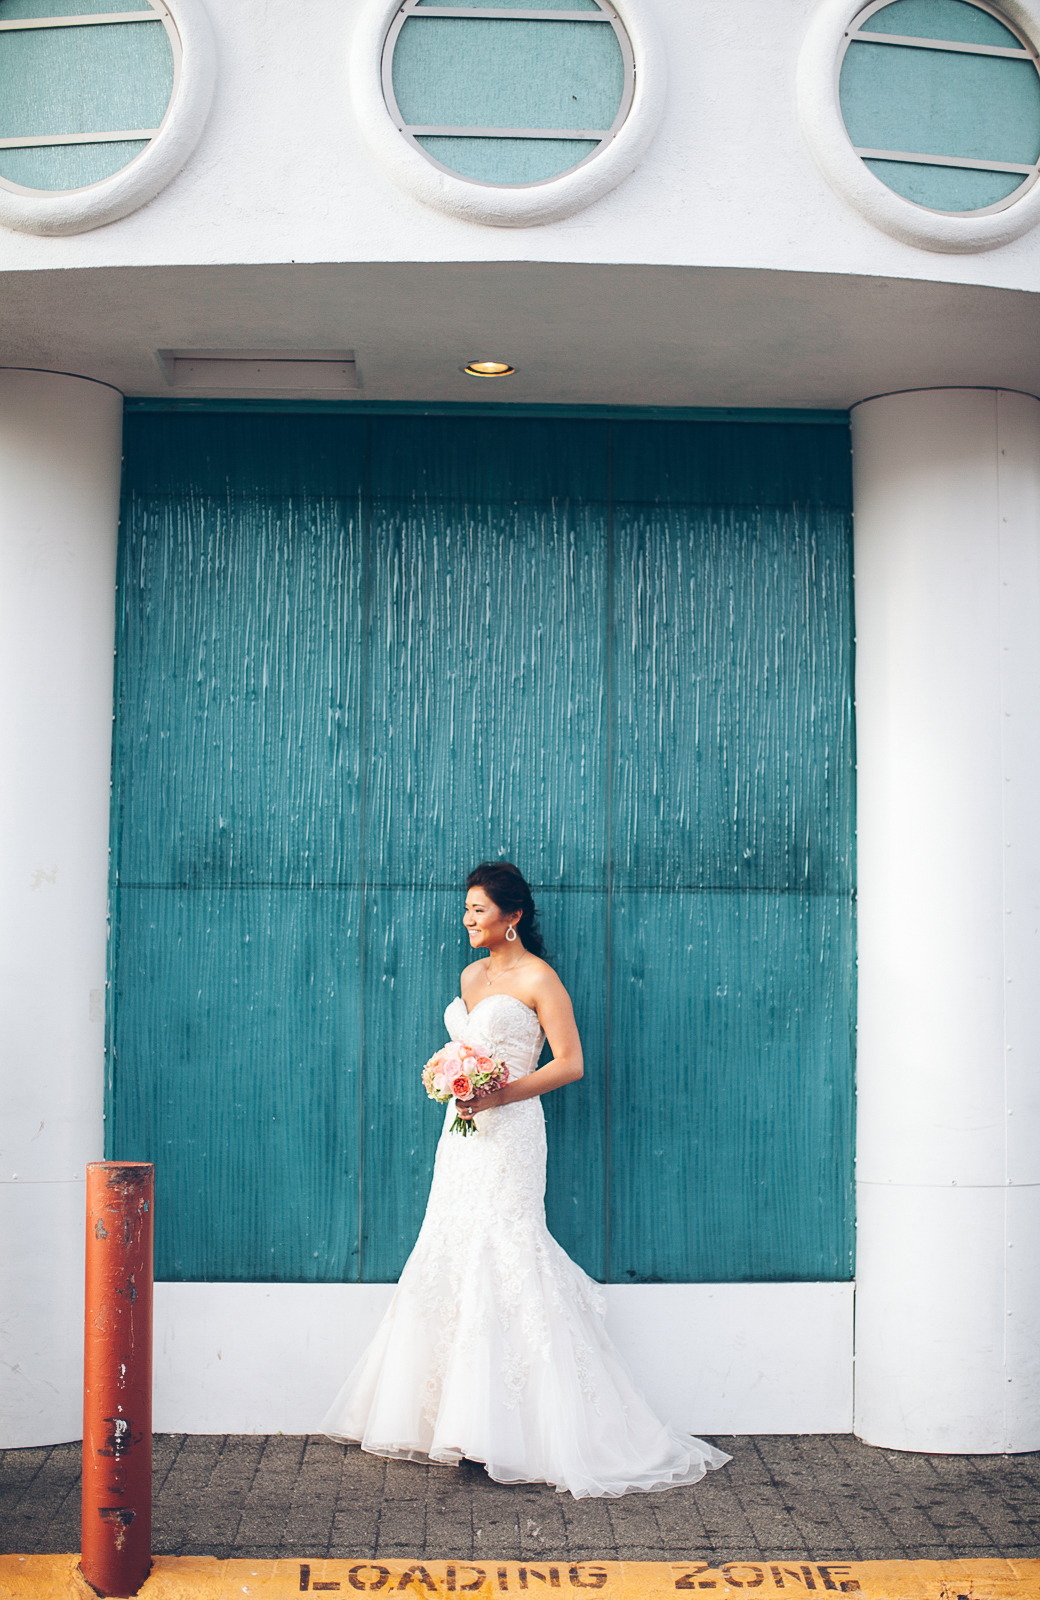 San_francisco_city_hall_wedding_photography_meegan_travis_ebony_siovhan_bokeh_photography_81.jpg